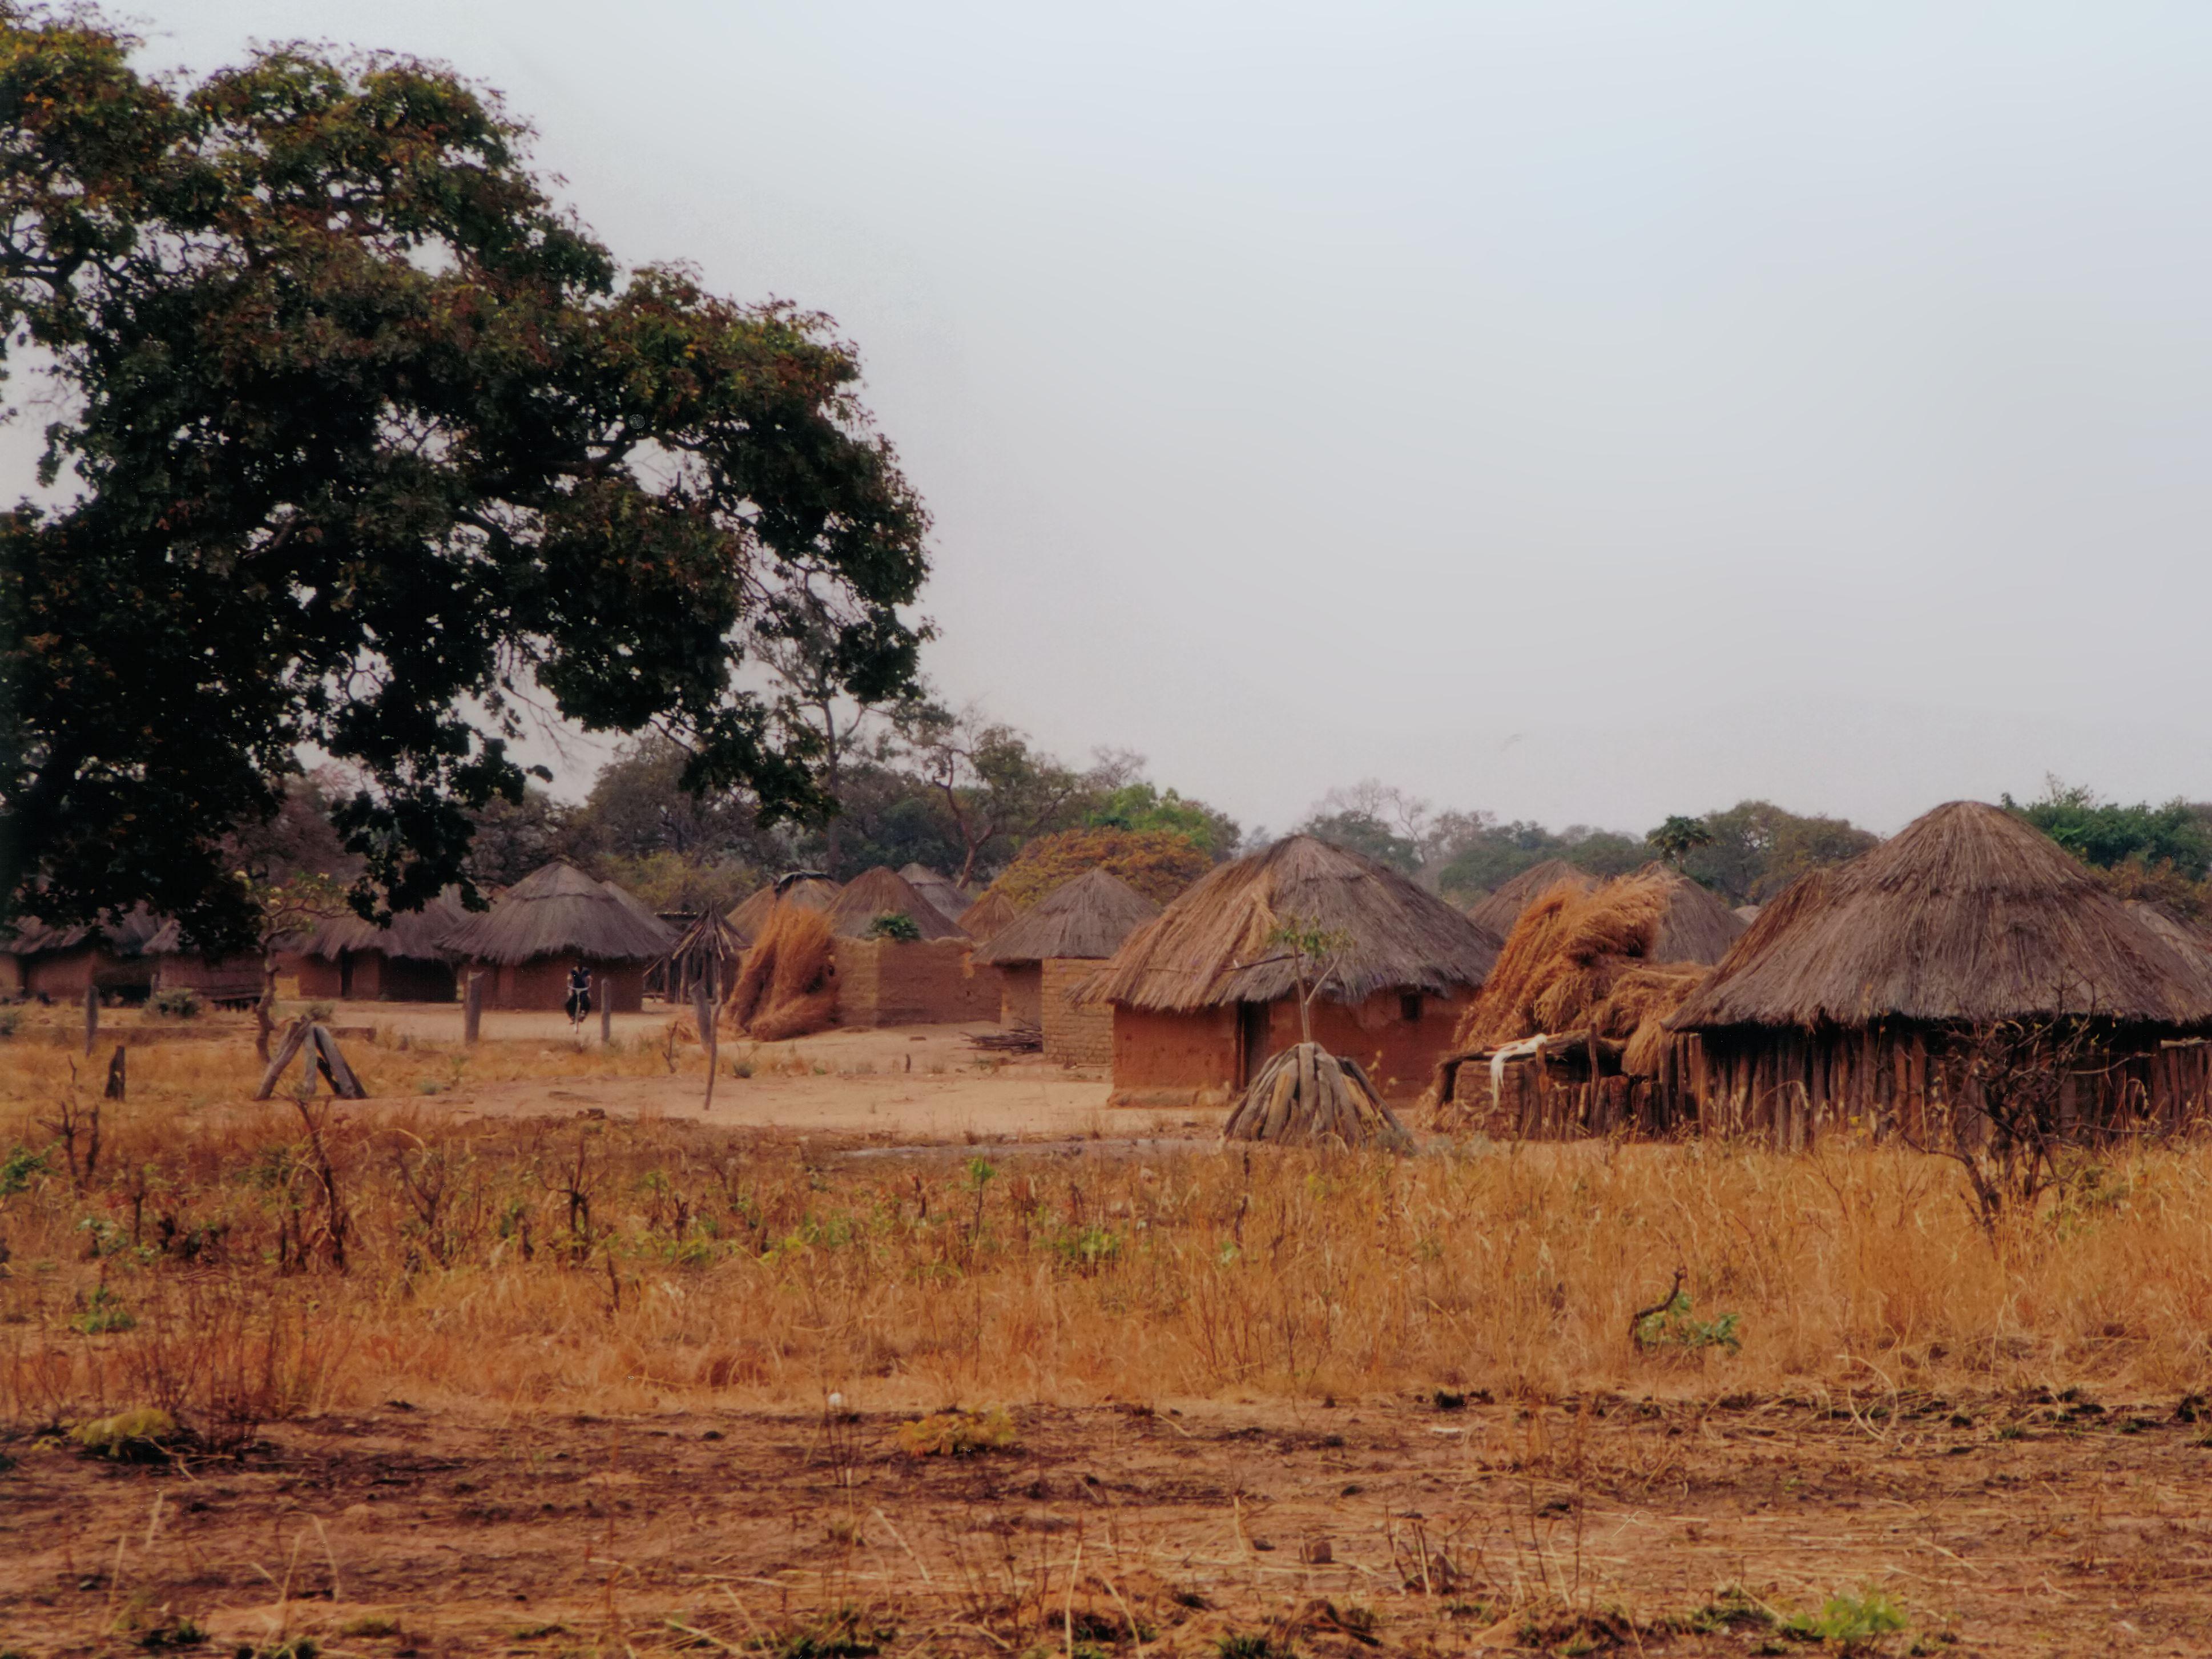 Ulrik Alm - Luangwa - vildmark och by i Zambia